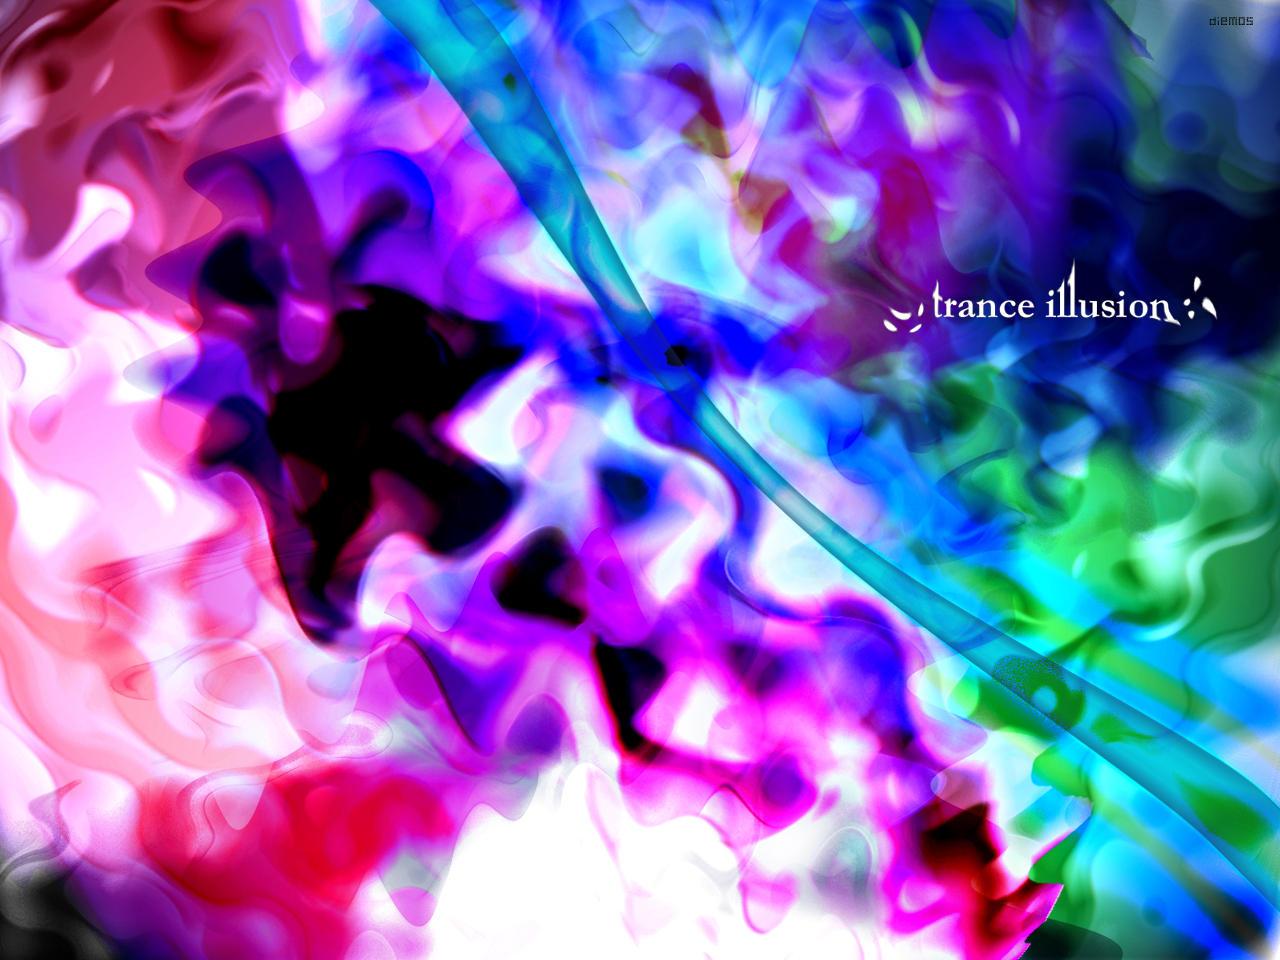 Trance Illusion by ldiemosl